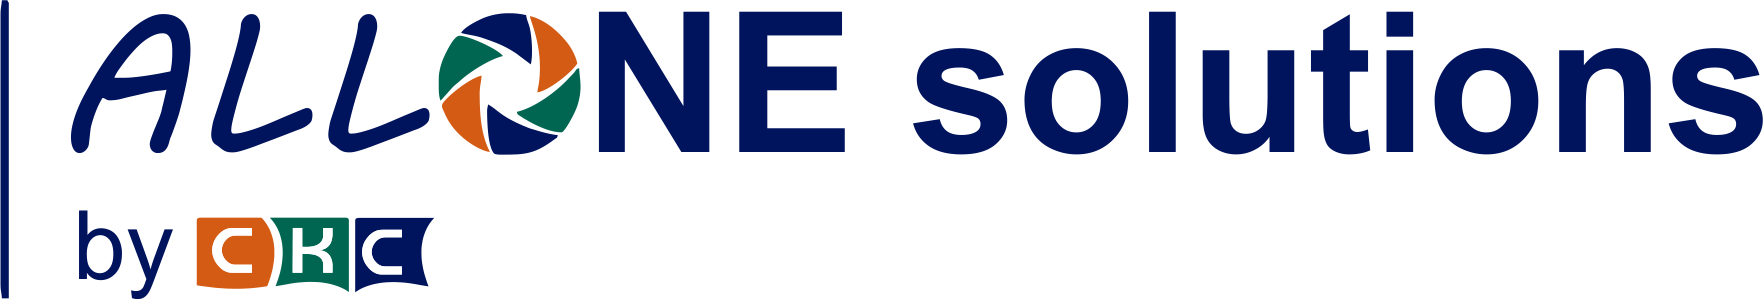 Cyprus Kiosk Company